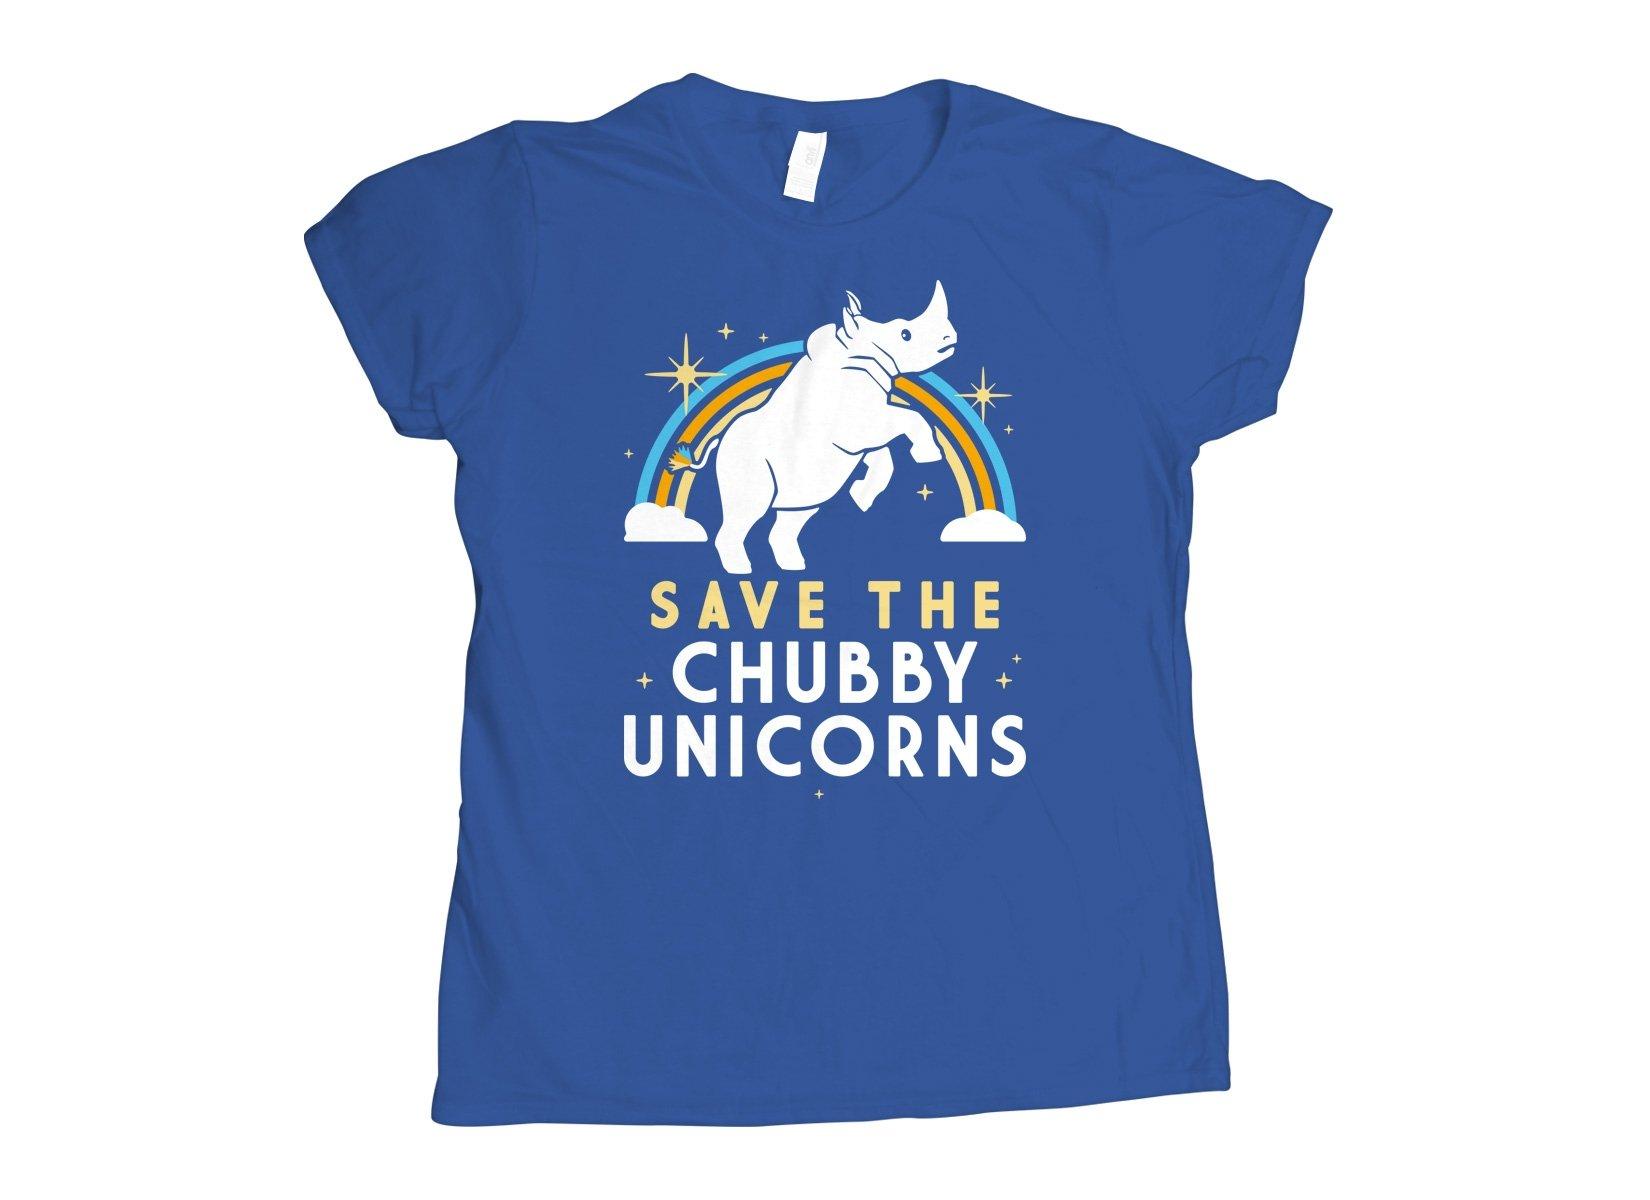 Save The Chubby Unicorns on Womens T-Shirt